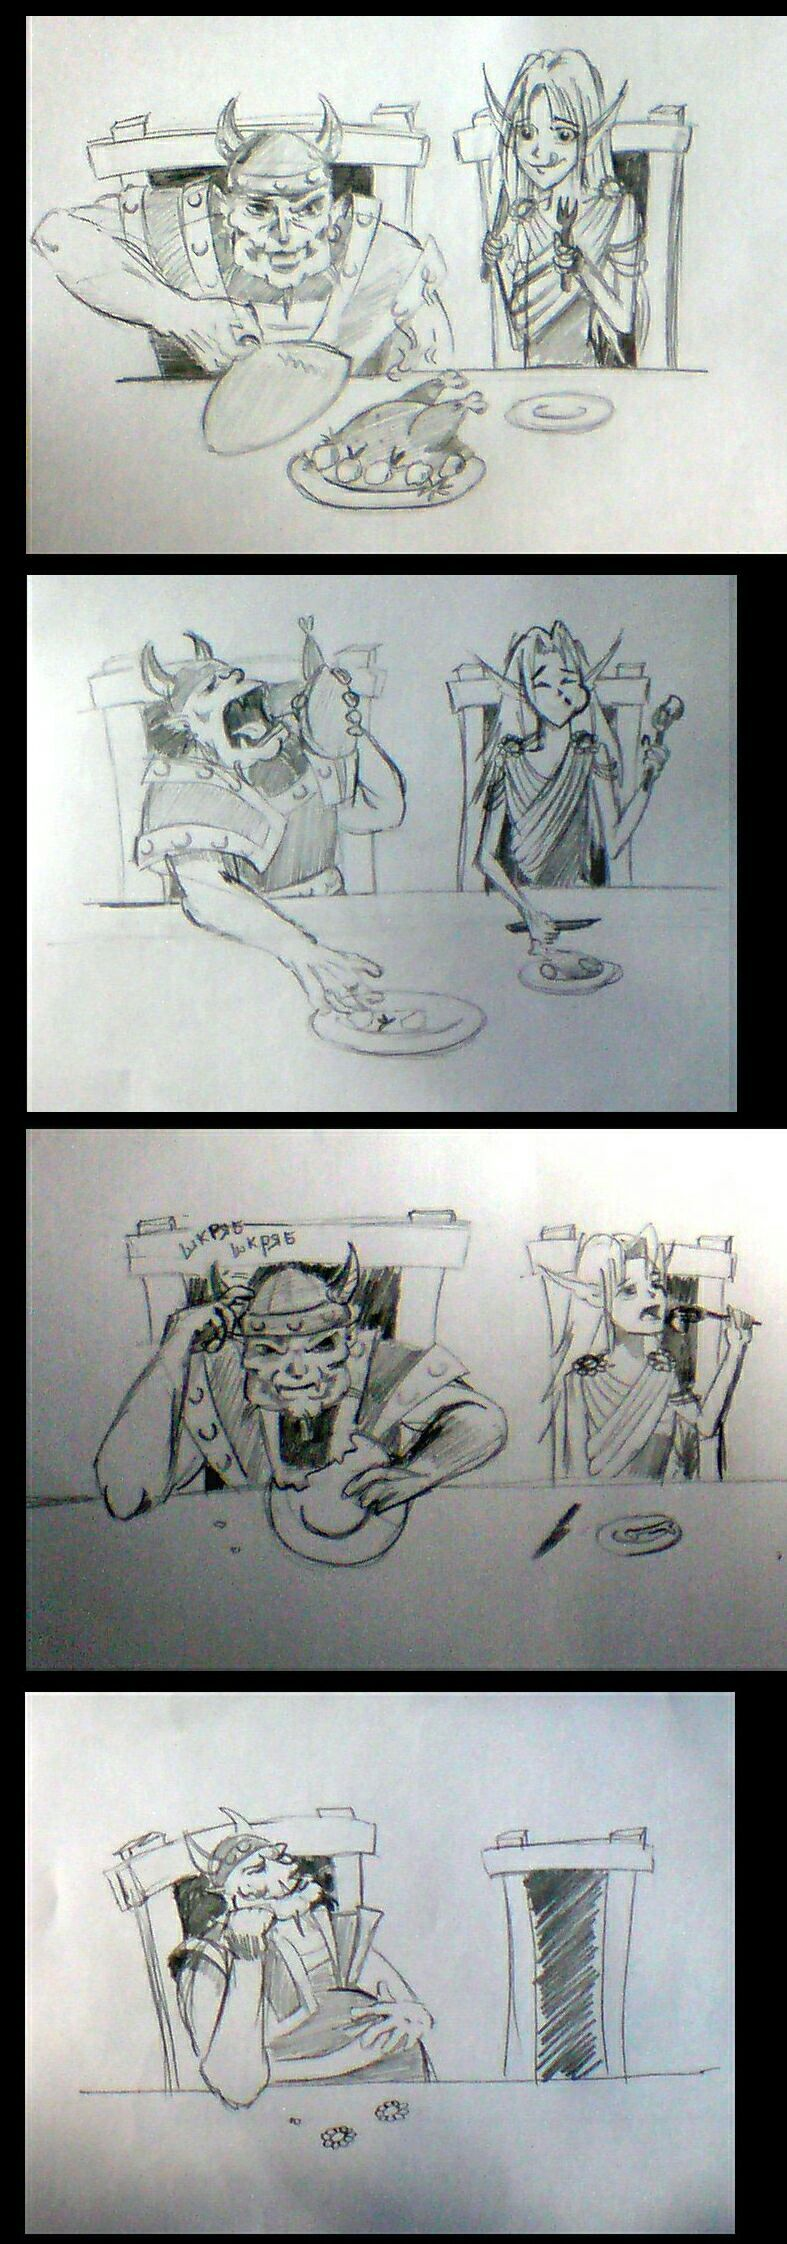 Комикс битва №16 выпуск 27